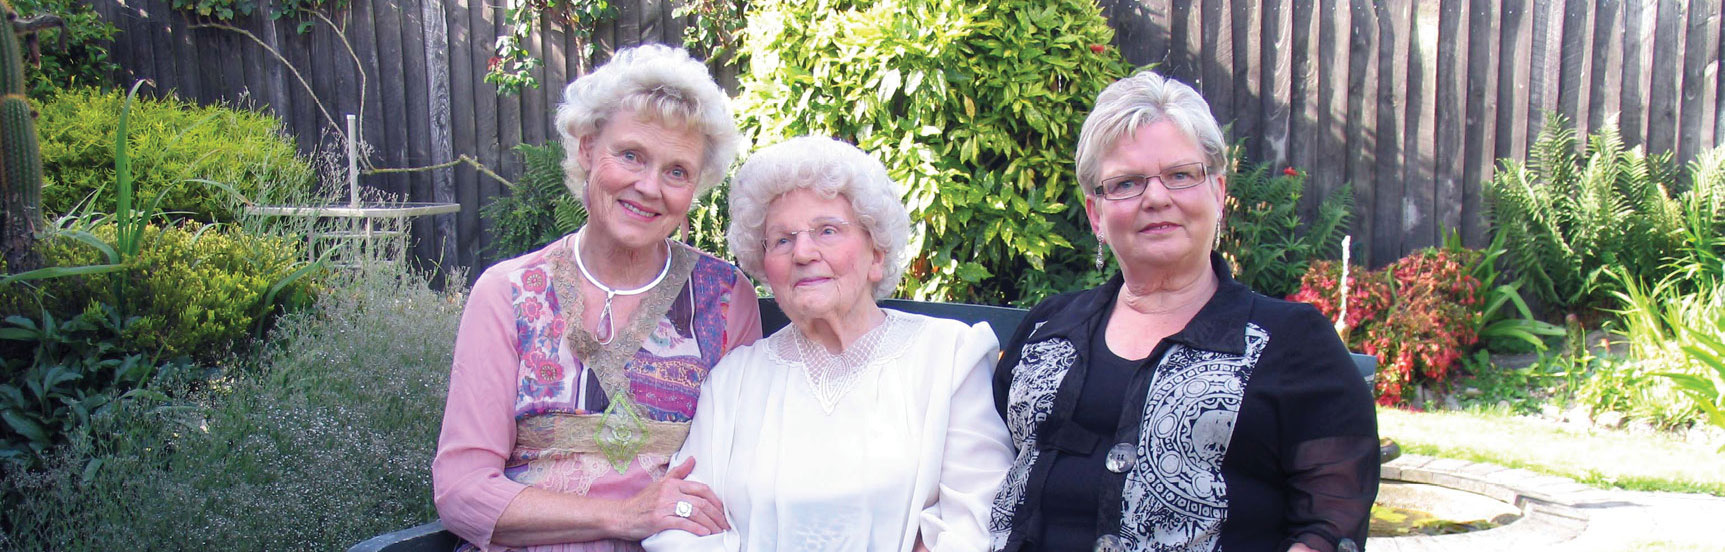 Dr Allison Lamont, Gillian Eadie & Jeanie